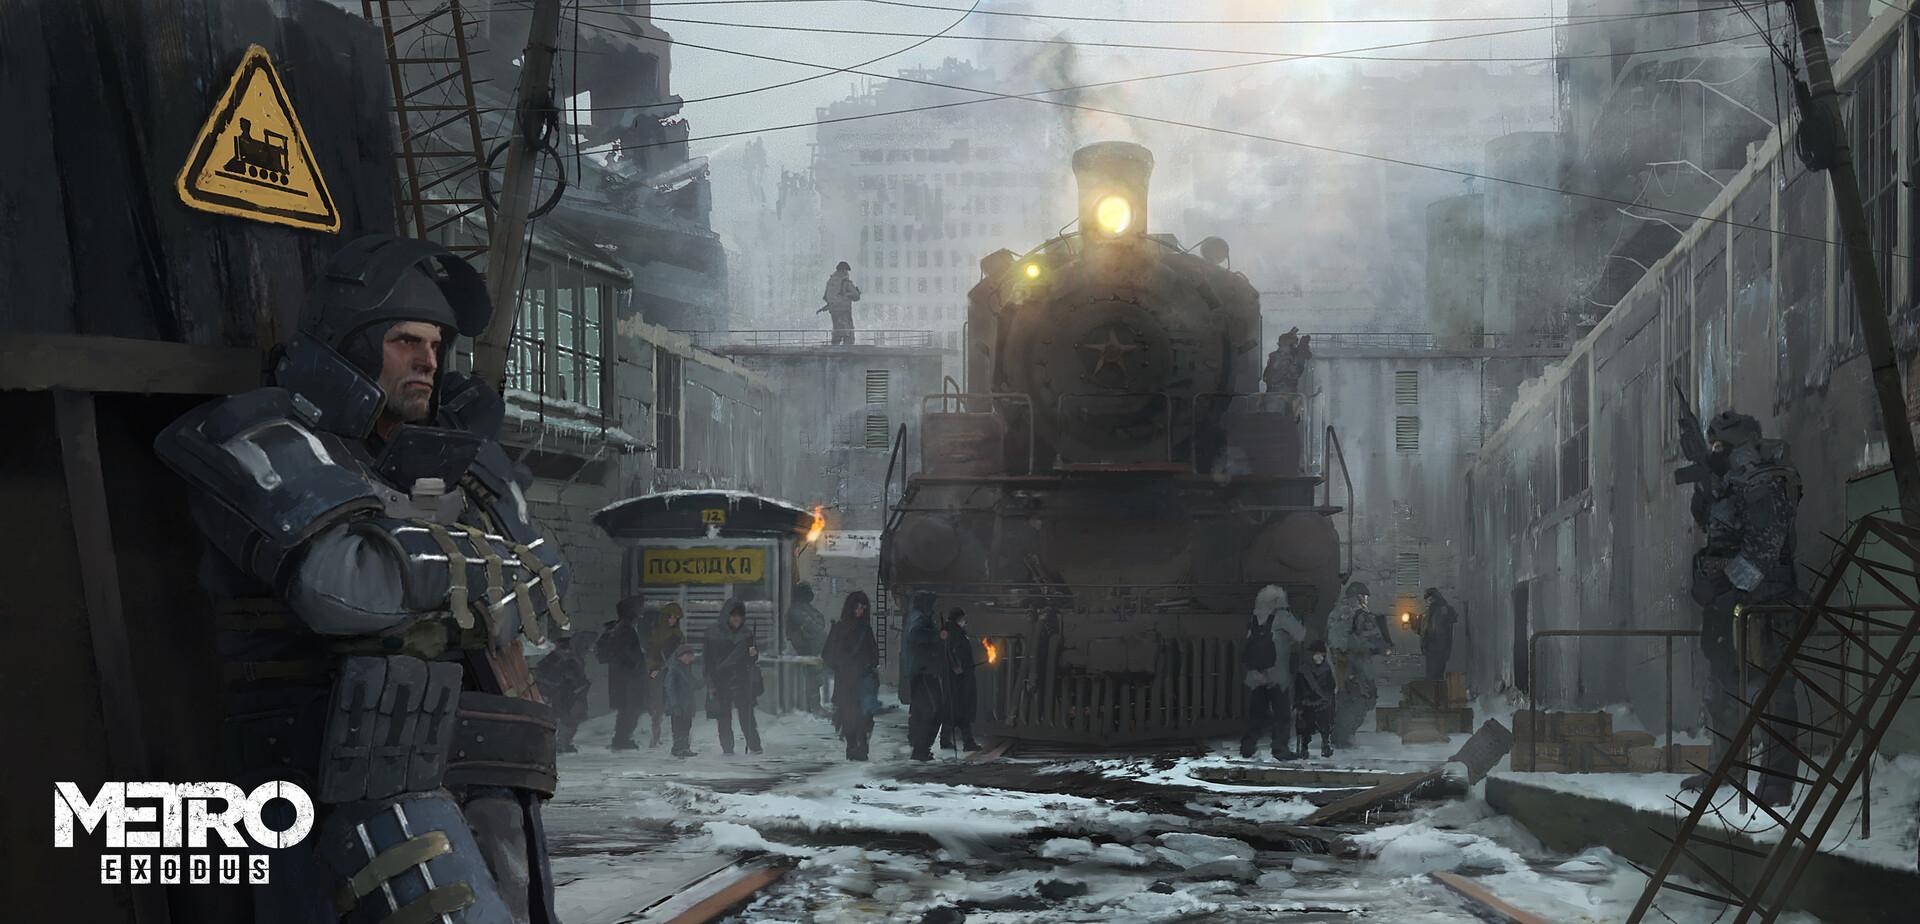 https://cdnb.artstation.com/p/assets/images/images/016/095/199/large/rostyslav-zagornov-exile.jpg?1550863062